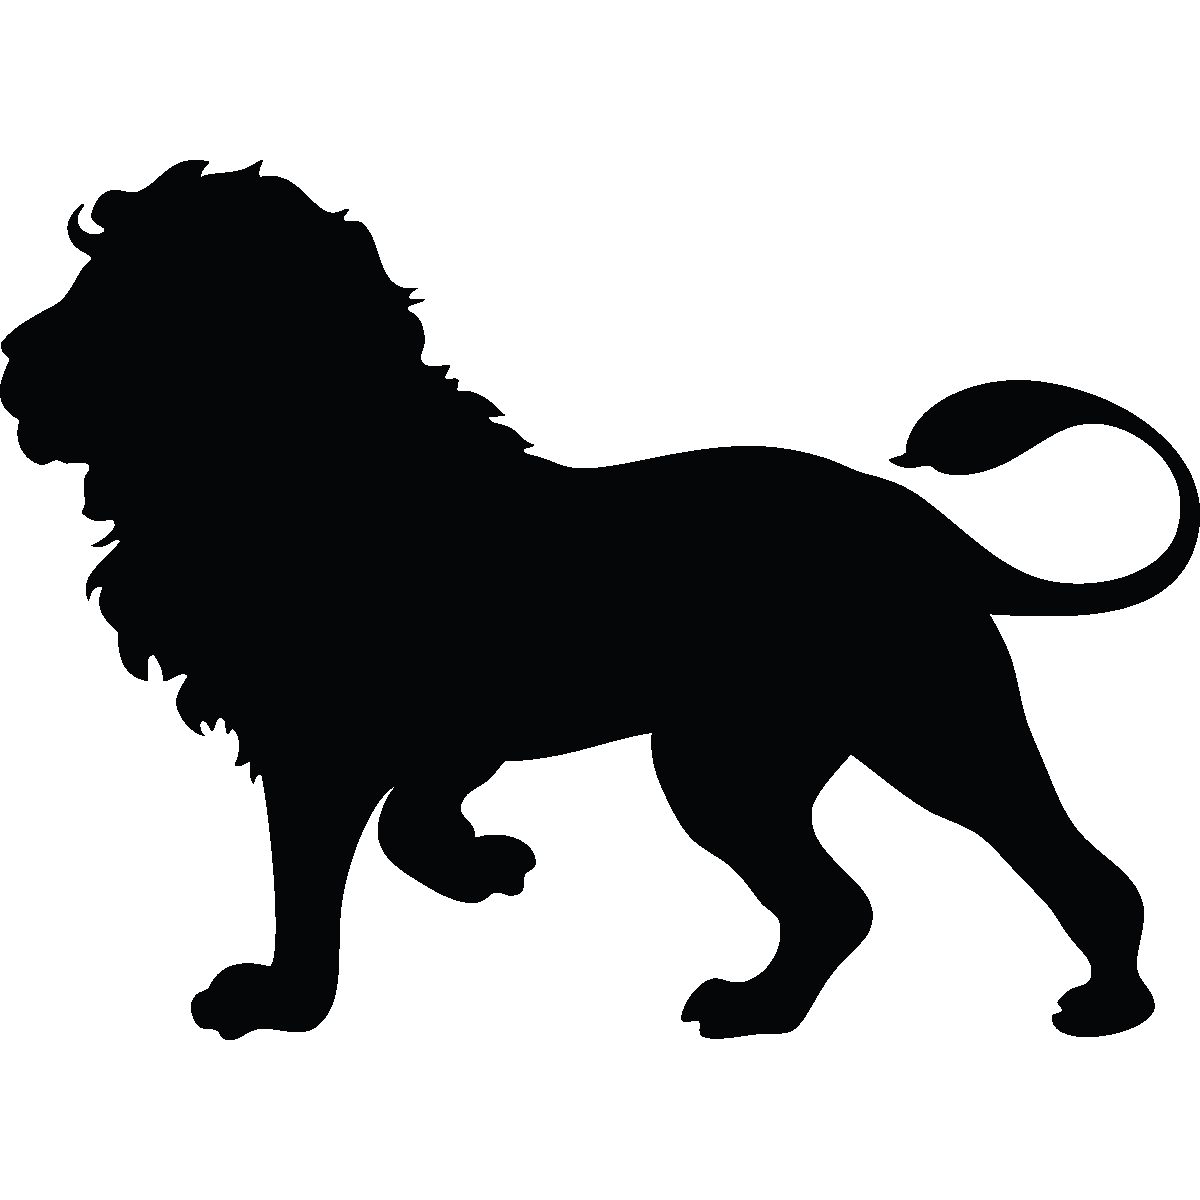 Stickers Muraux Animaux Sticker Silhouette Lion